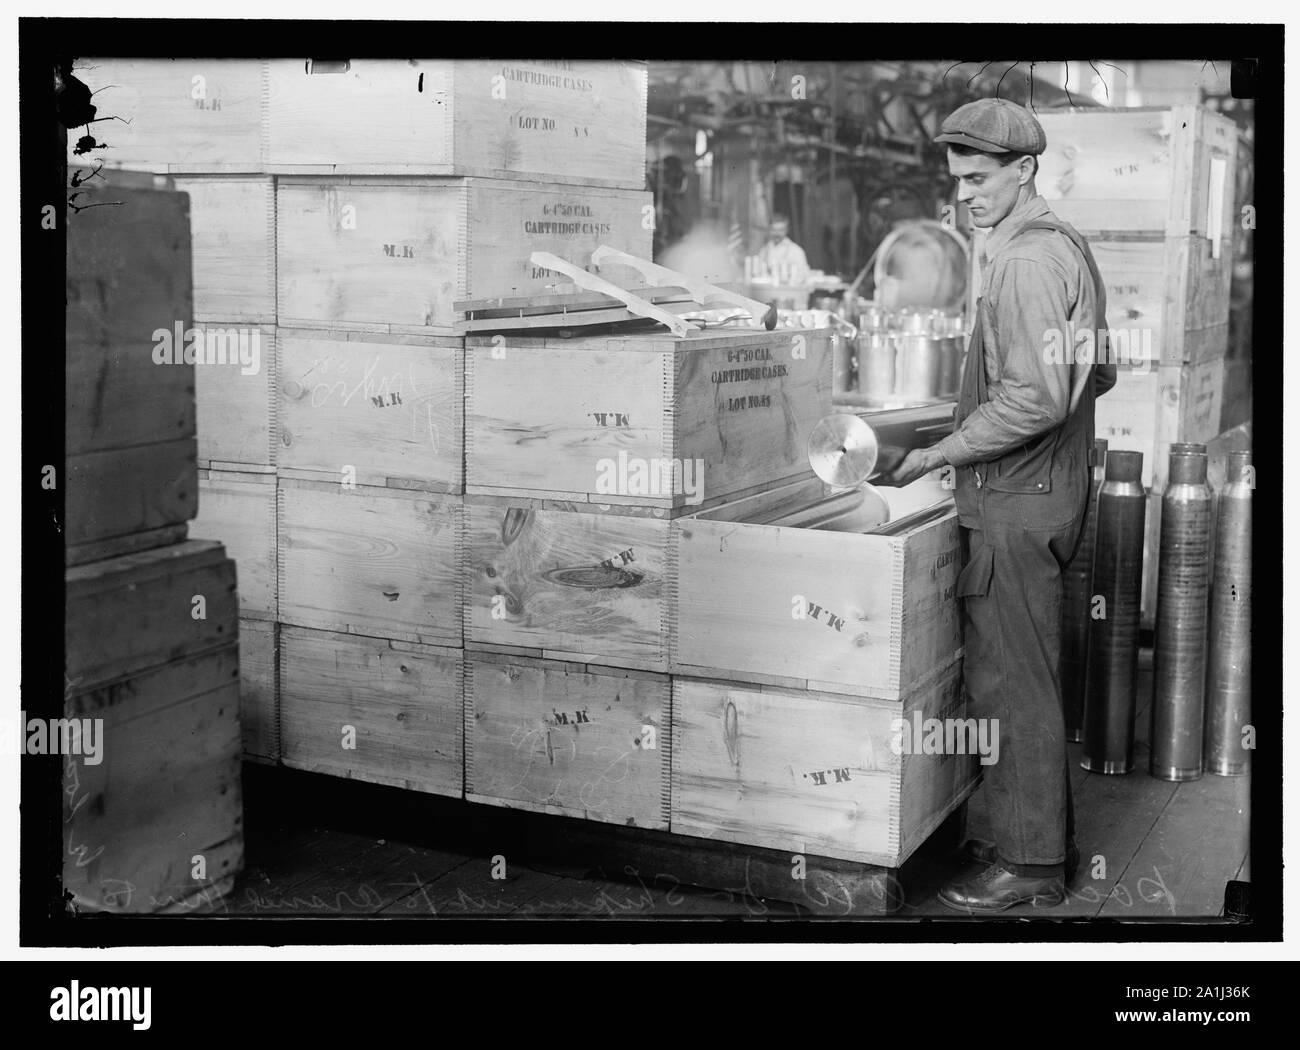 NAVY YARD, U.S., WASHINGTON. PACKING AND HANDLING CARTRIDGE CASES Stock Photo